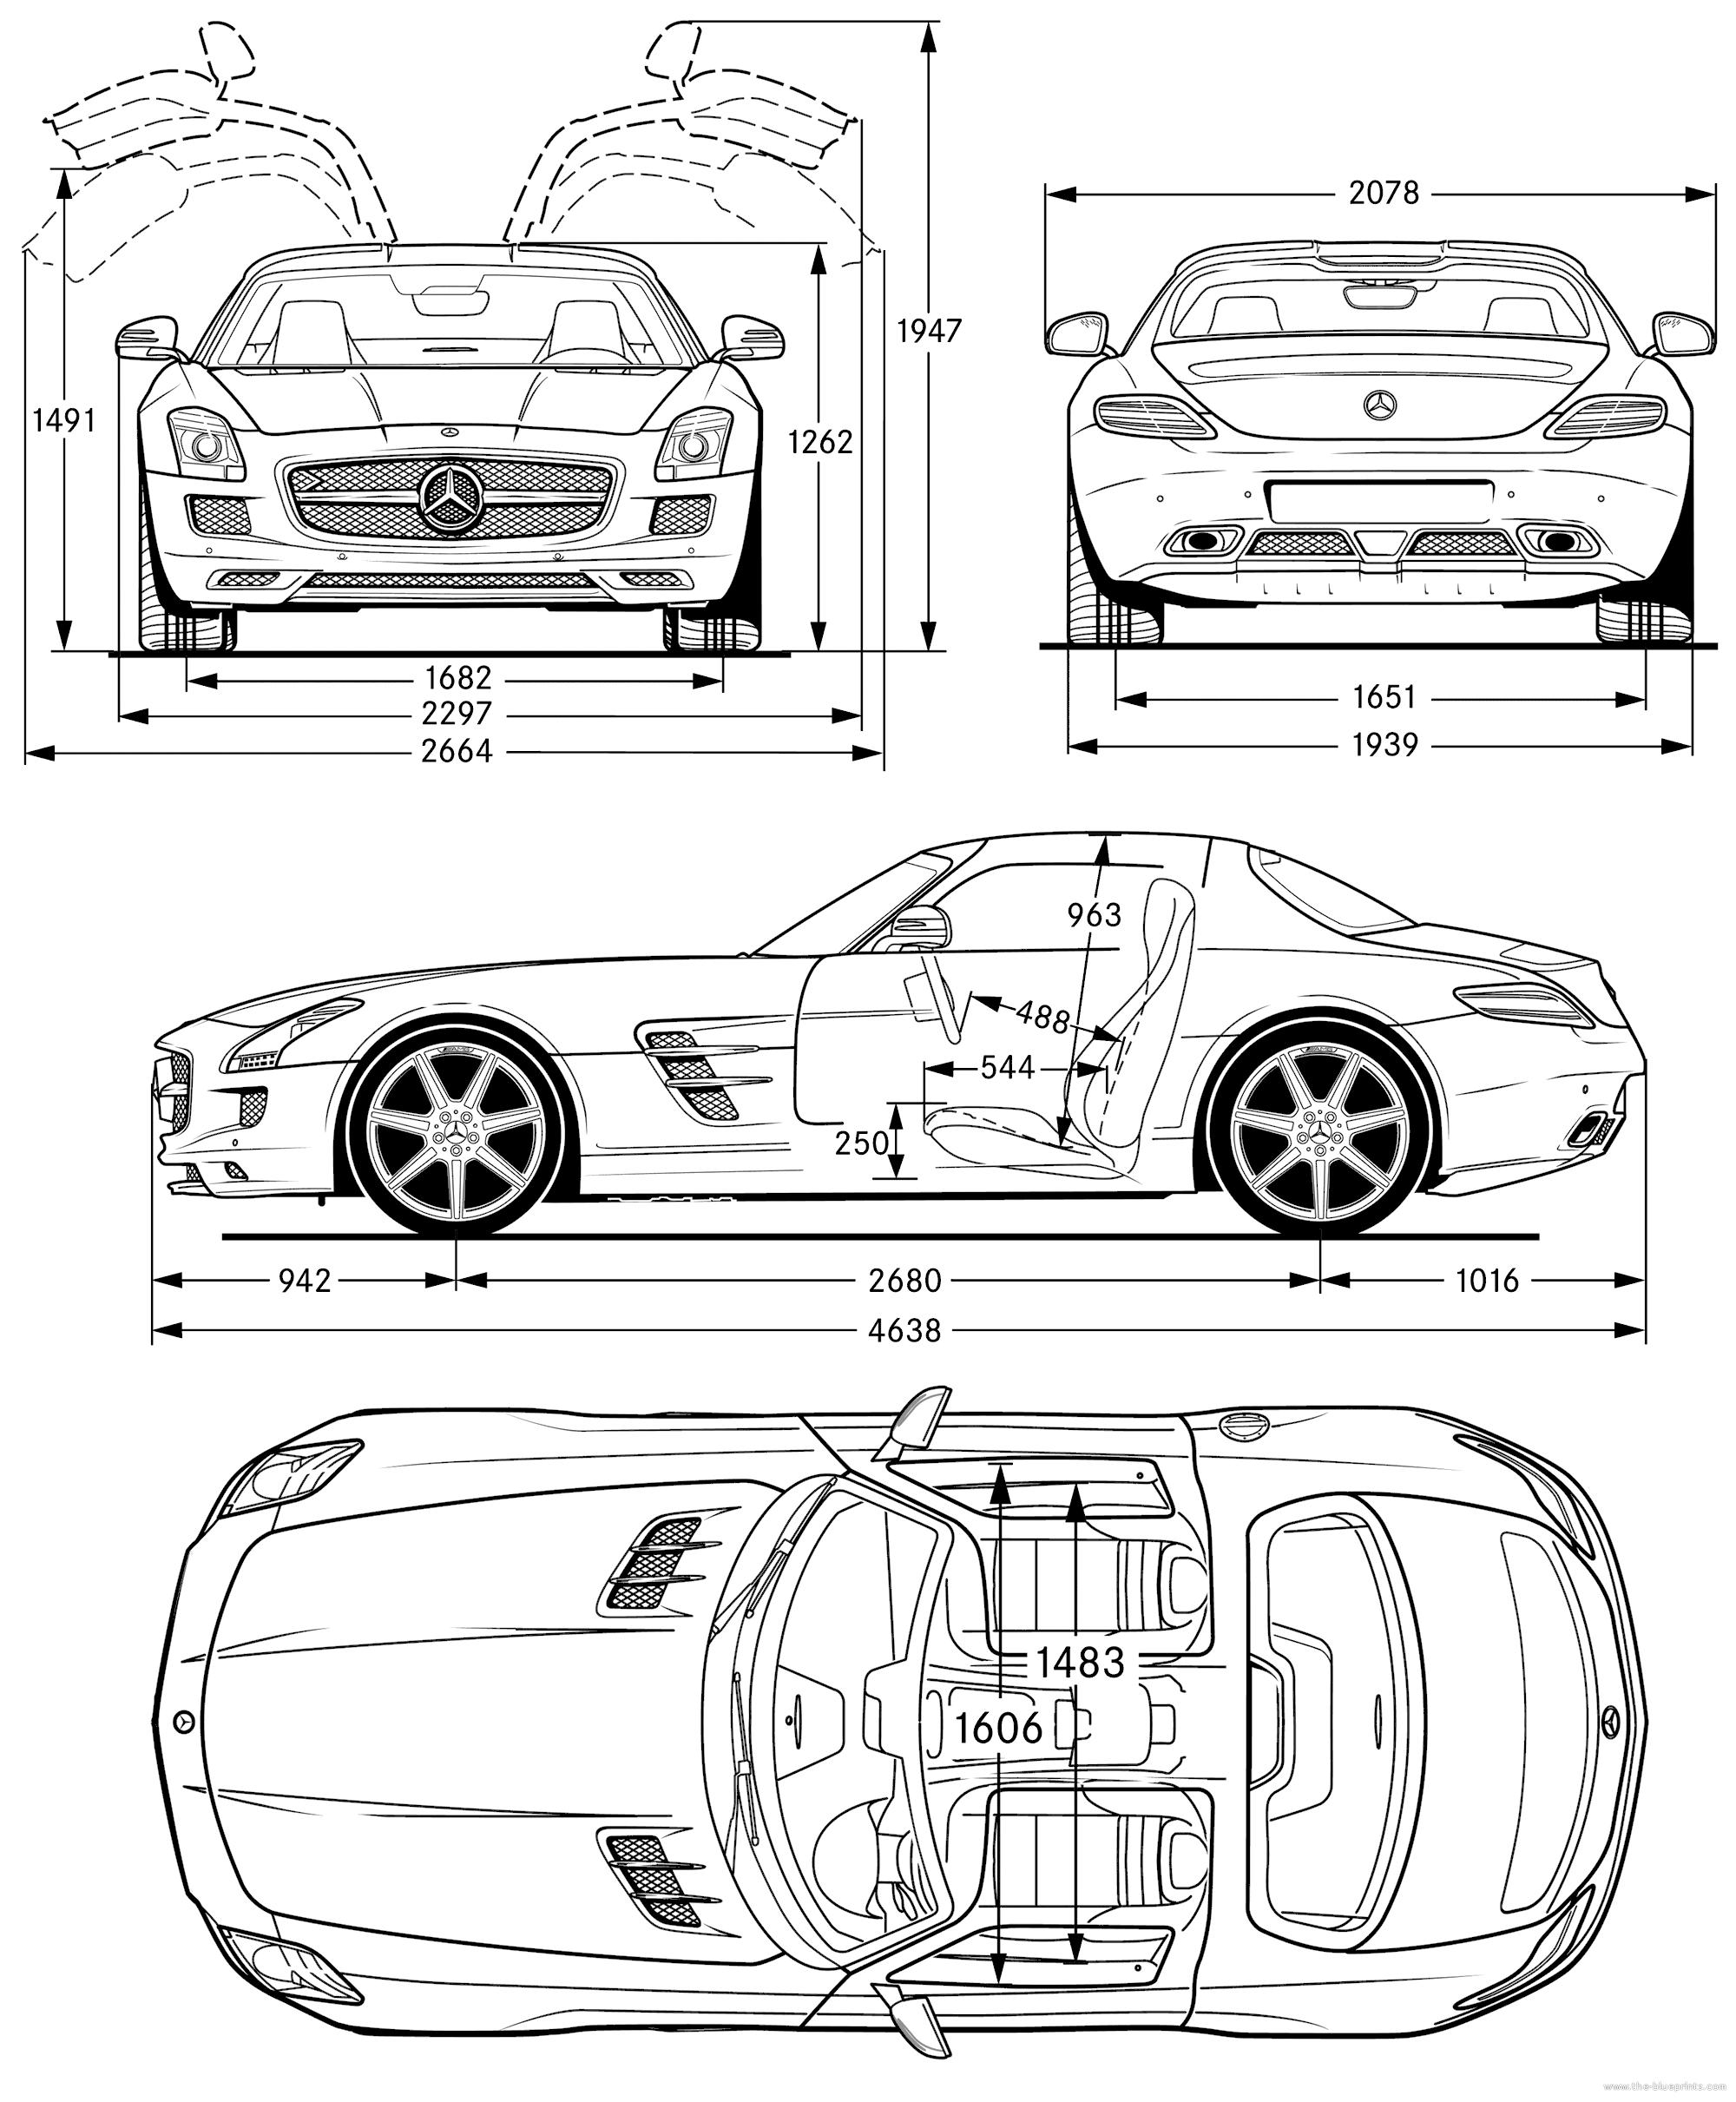 Mercedes Benz Amg Sls The Blueprints